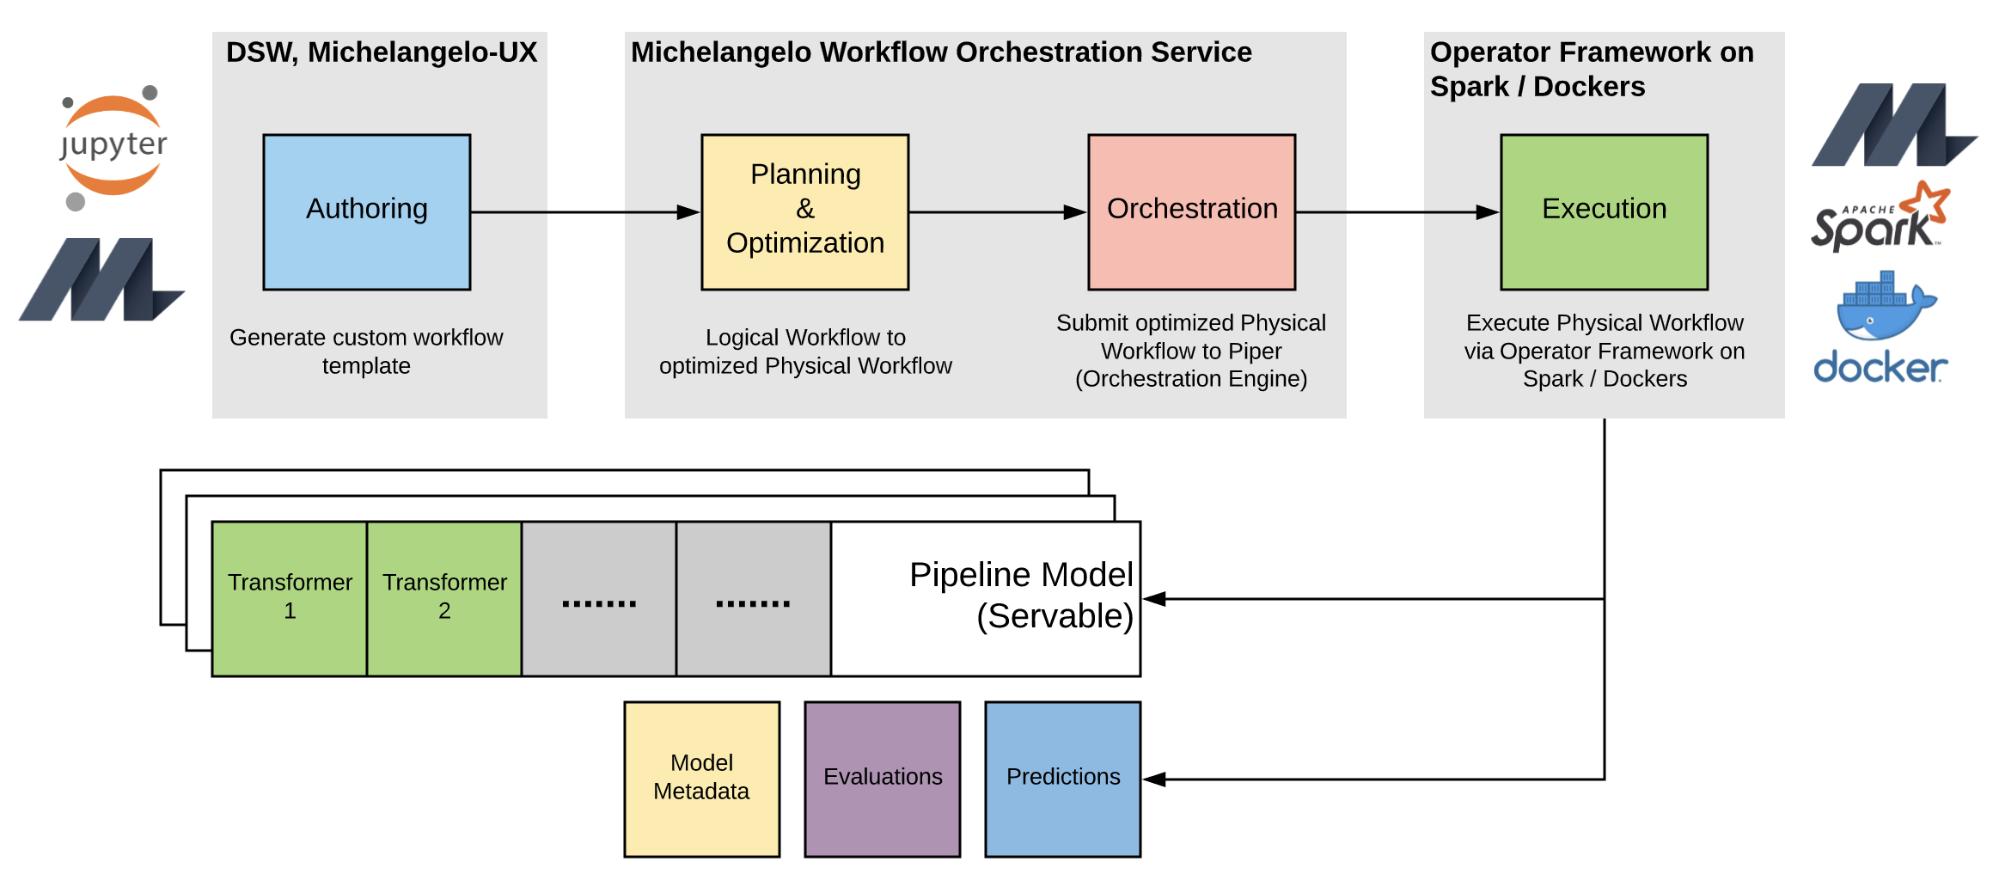 Michelangelo 基于 Operator Framework 的工作流提供了另一种程度的灵活性,通过优化的执行计划来方便地定制操作,从而生成可服务的、序列化的 Michelangelo 管道模型以及有用的工件。Apache Spark 是 Apache 软件基金会在美国和 / 或其他国家的注册商标。使用这个标记并不意味着 Apache 软件基金会的认可。Docker 和 Docker 标识是 Docker 公司在美国和 / 或其他国家的商标或注册商标。Docker 公司及其他各方也可以在本协议中使用的其他条款中享有商标权。本标记的使用并不意味着 Docker 的认可。TensorFlow、TensorFlow 标识及任何相关标识均为谷歌公司的商标。